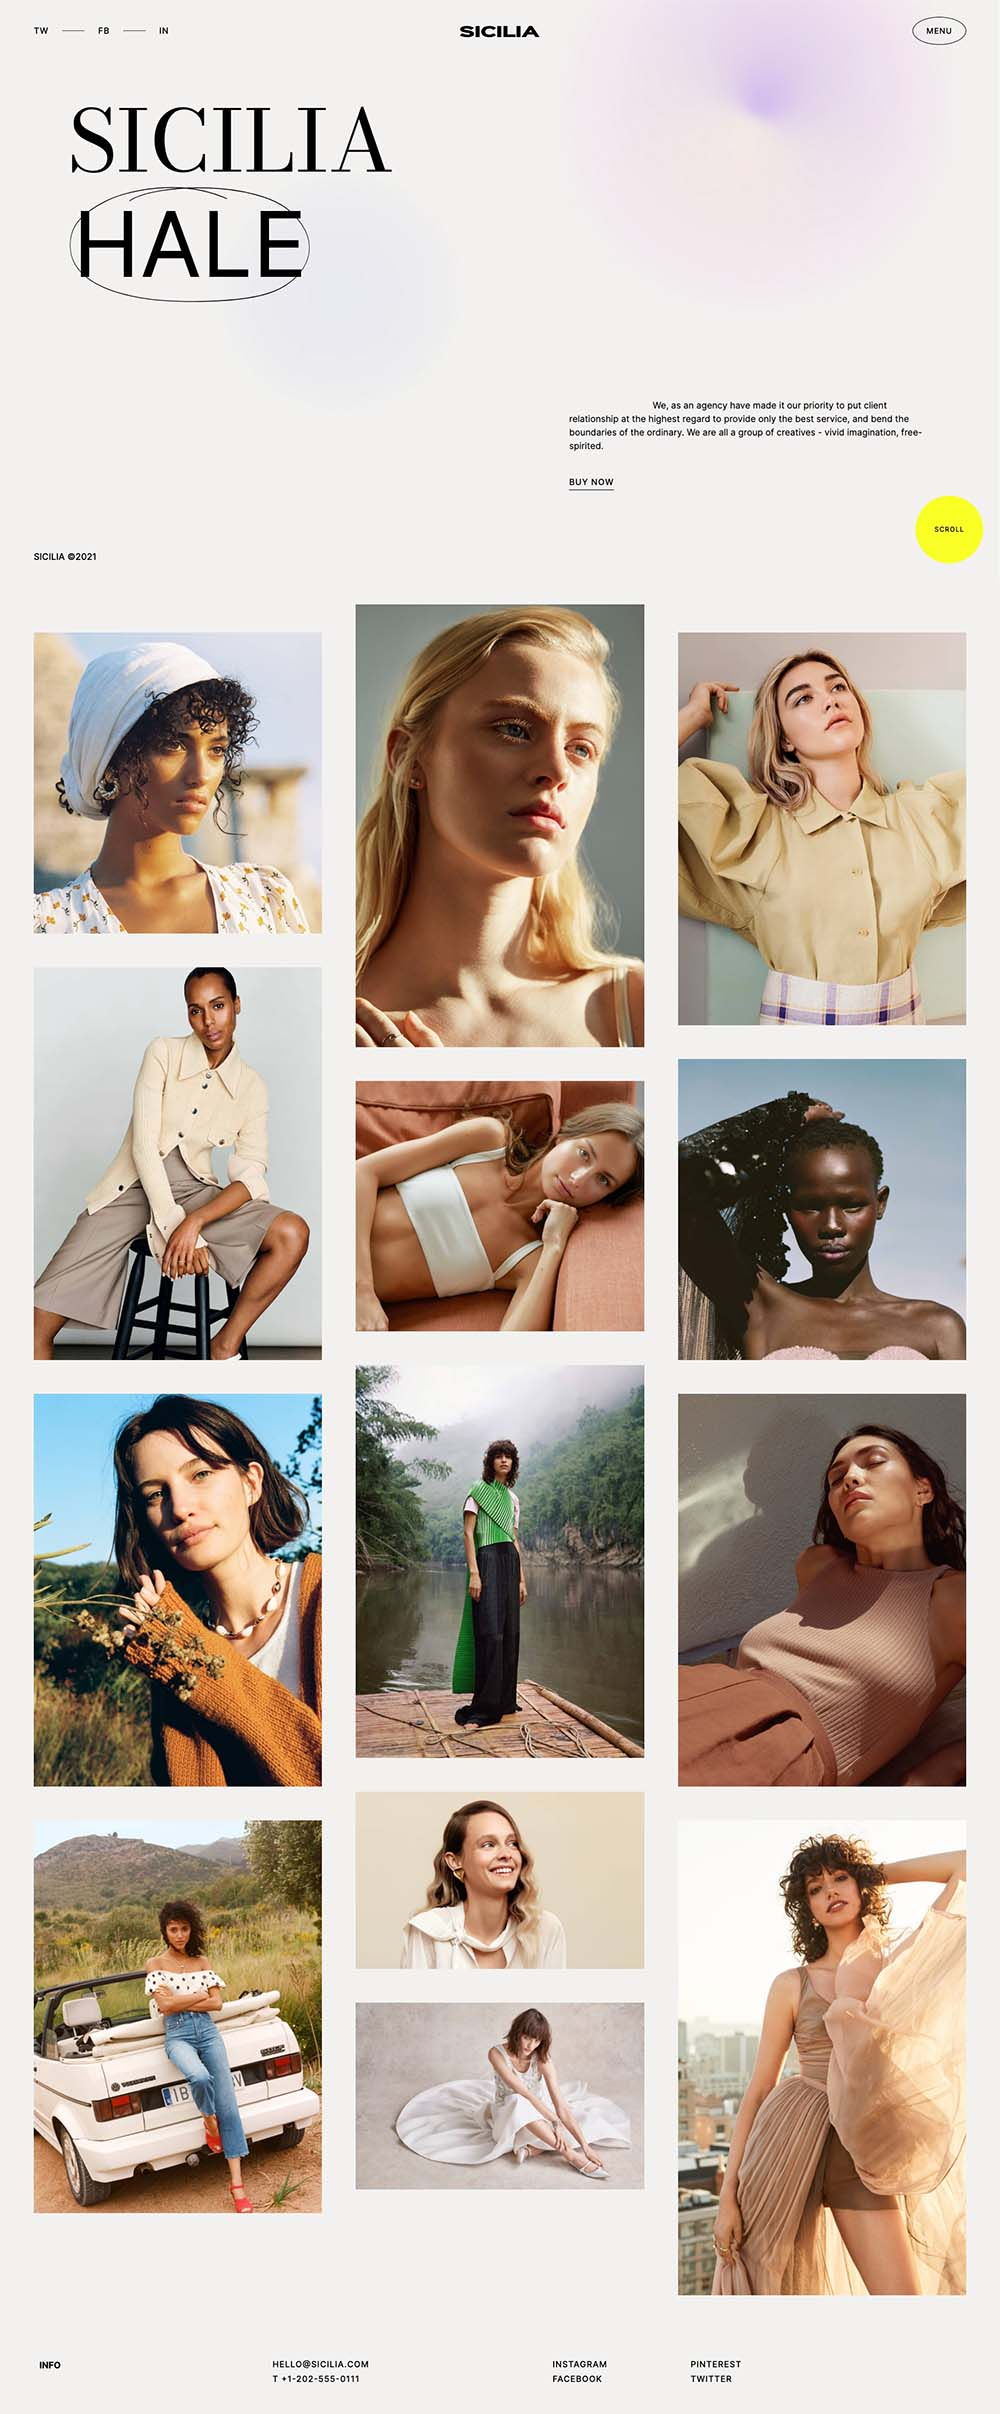 Sicilia Fashion Model Photographer Demo Website for WordPress